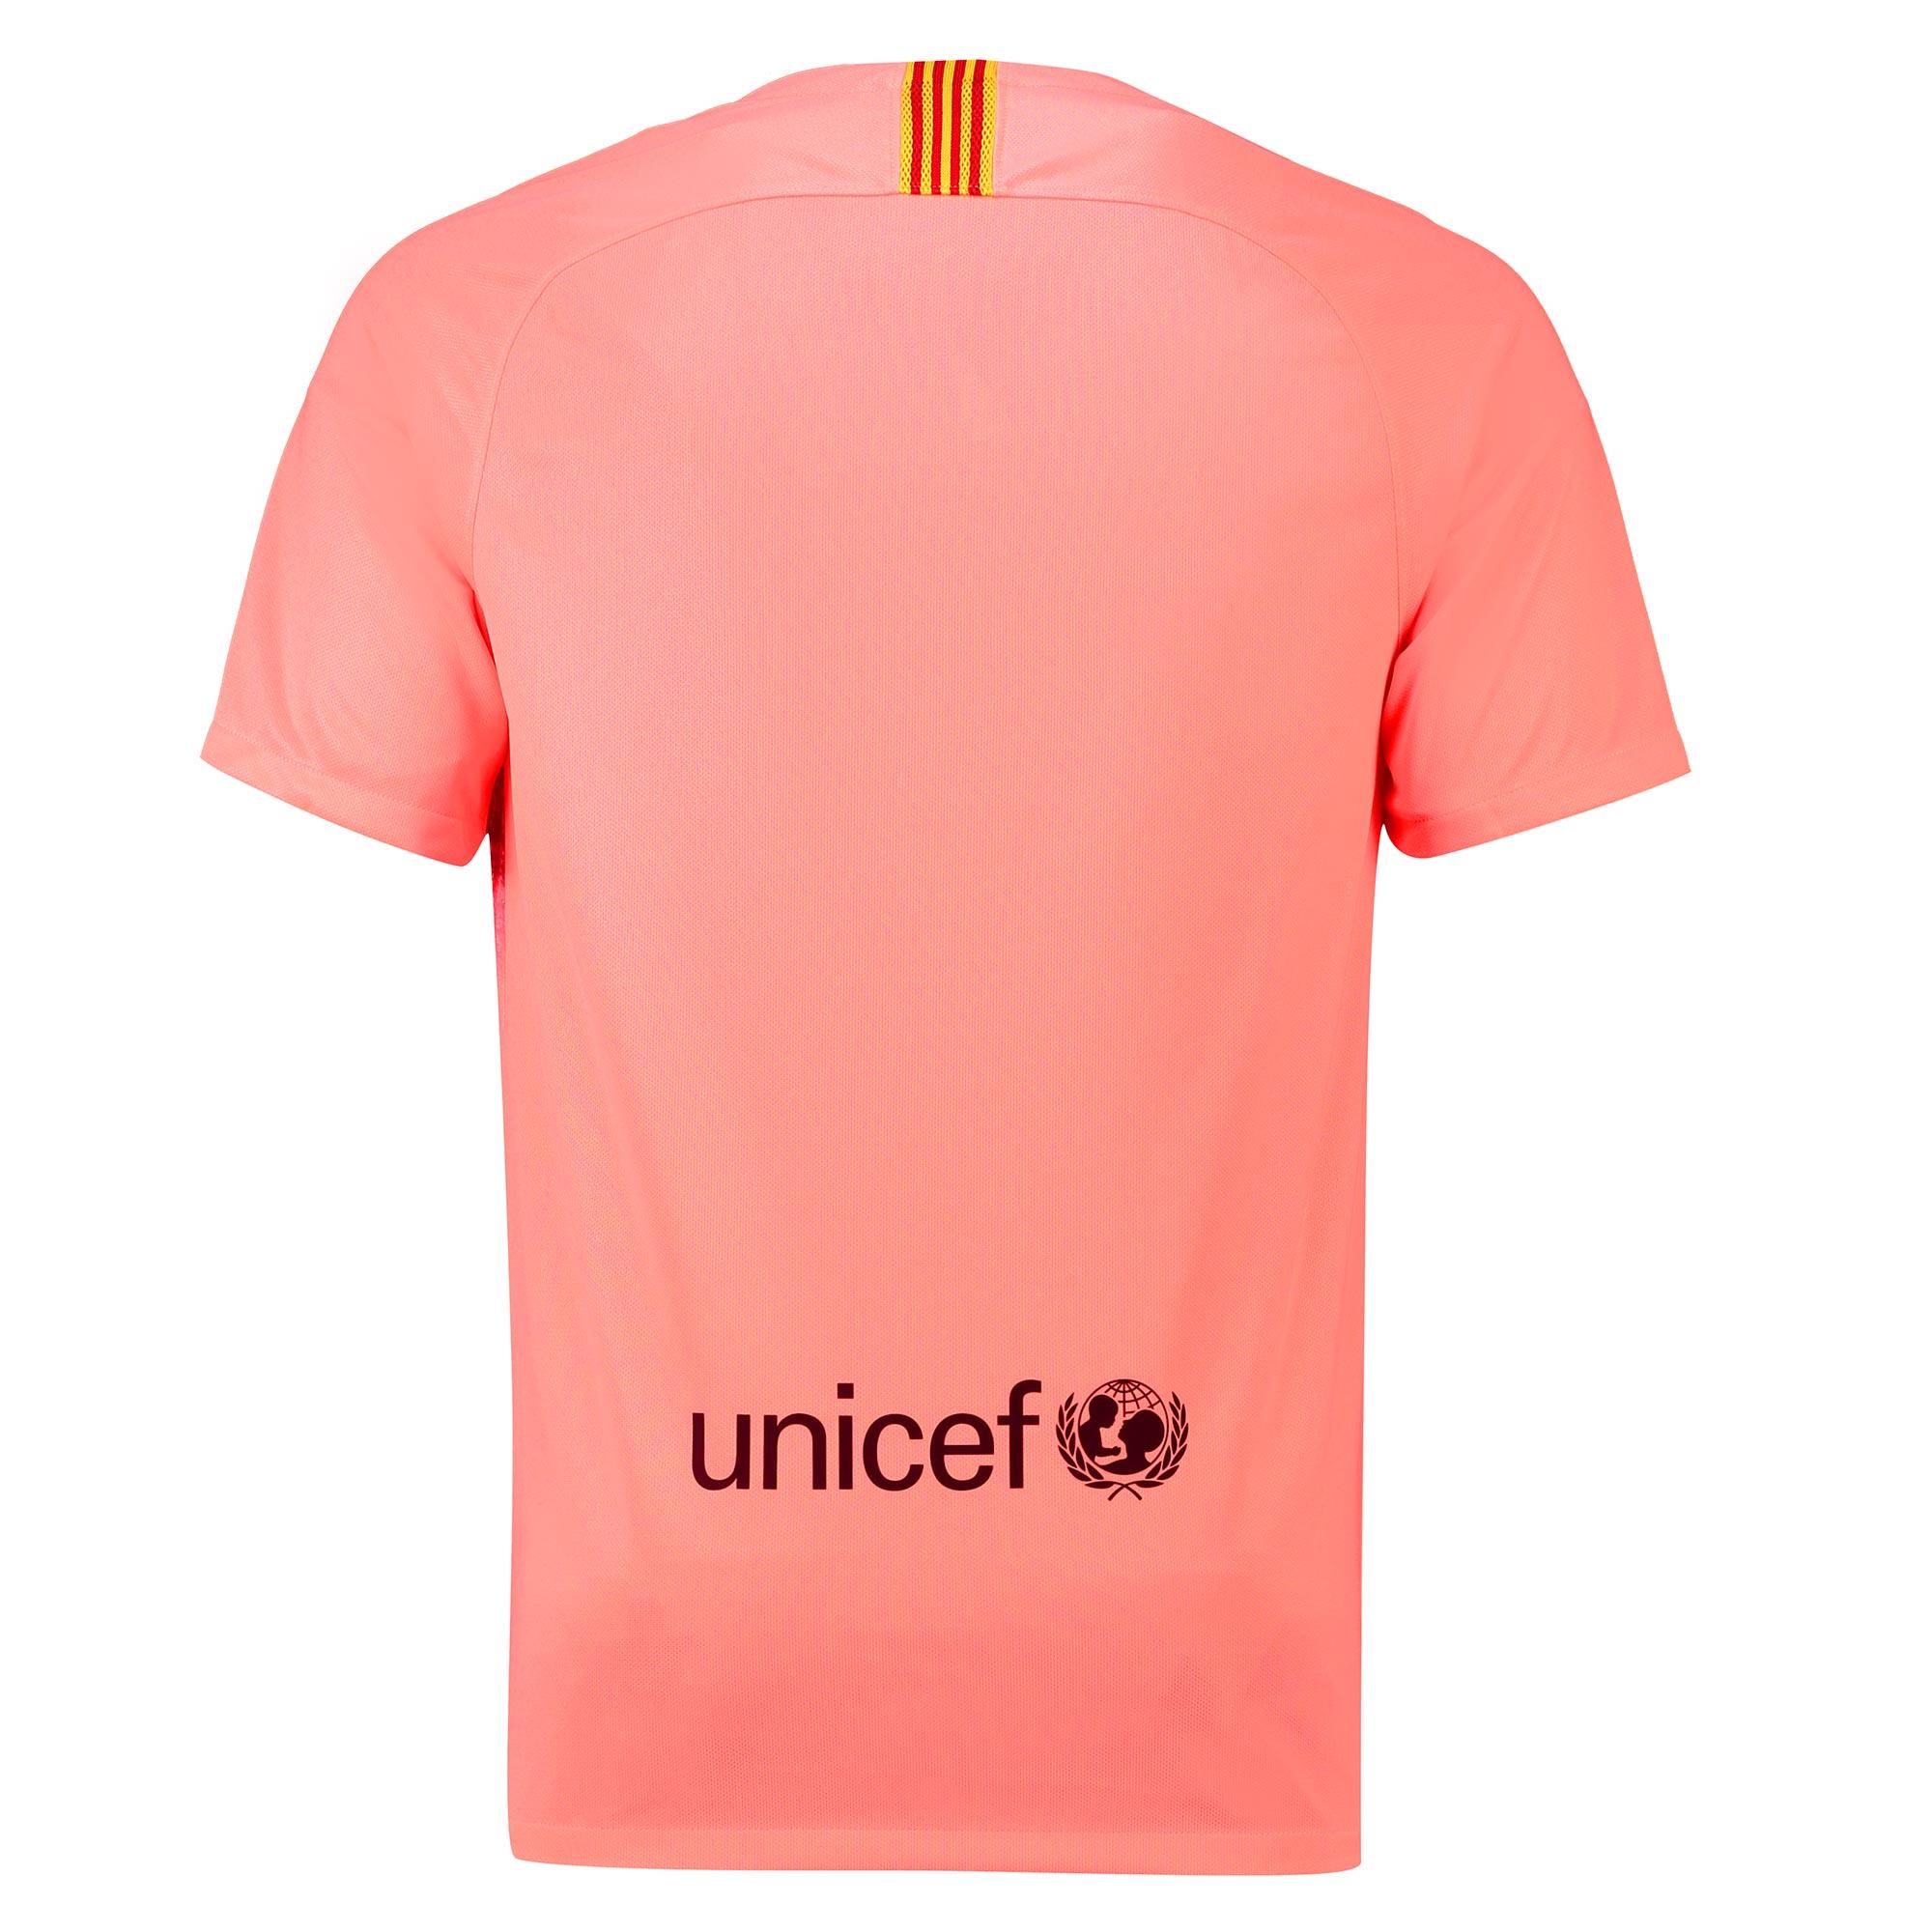 size 40 3be4c e702c Barcelona 2018-19 Nike Third Kit | 18/19 Kits | Football ...